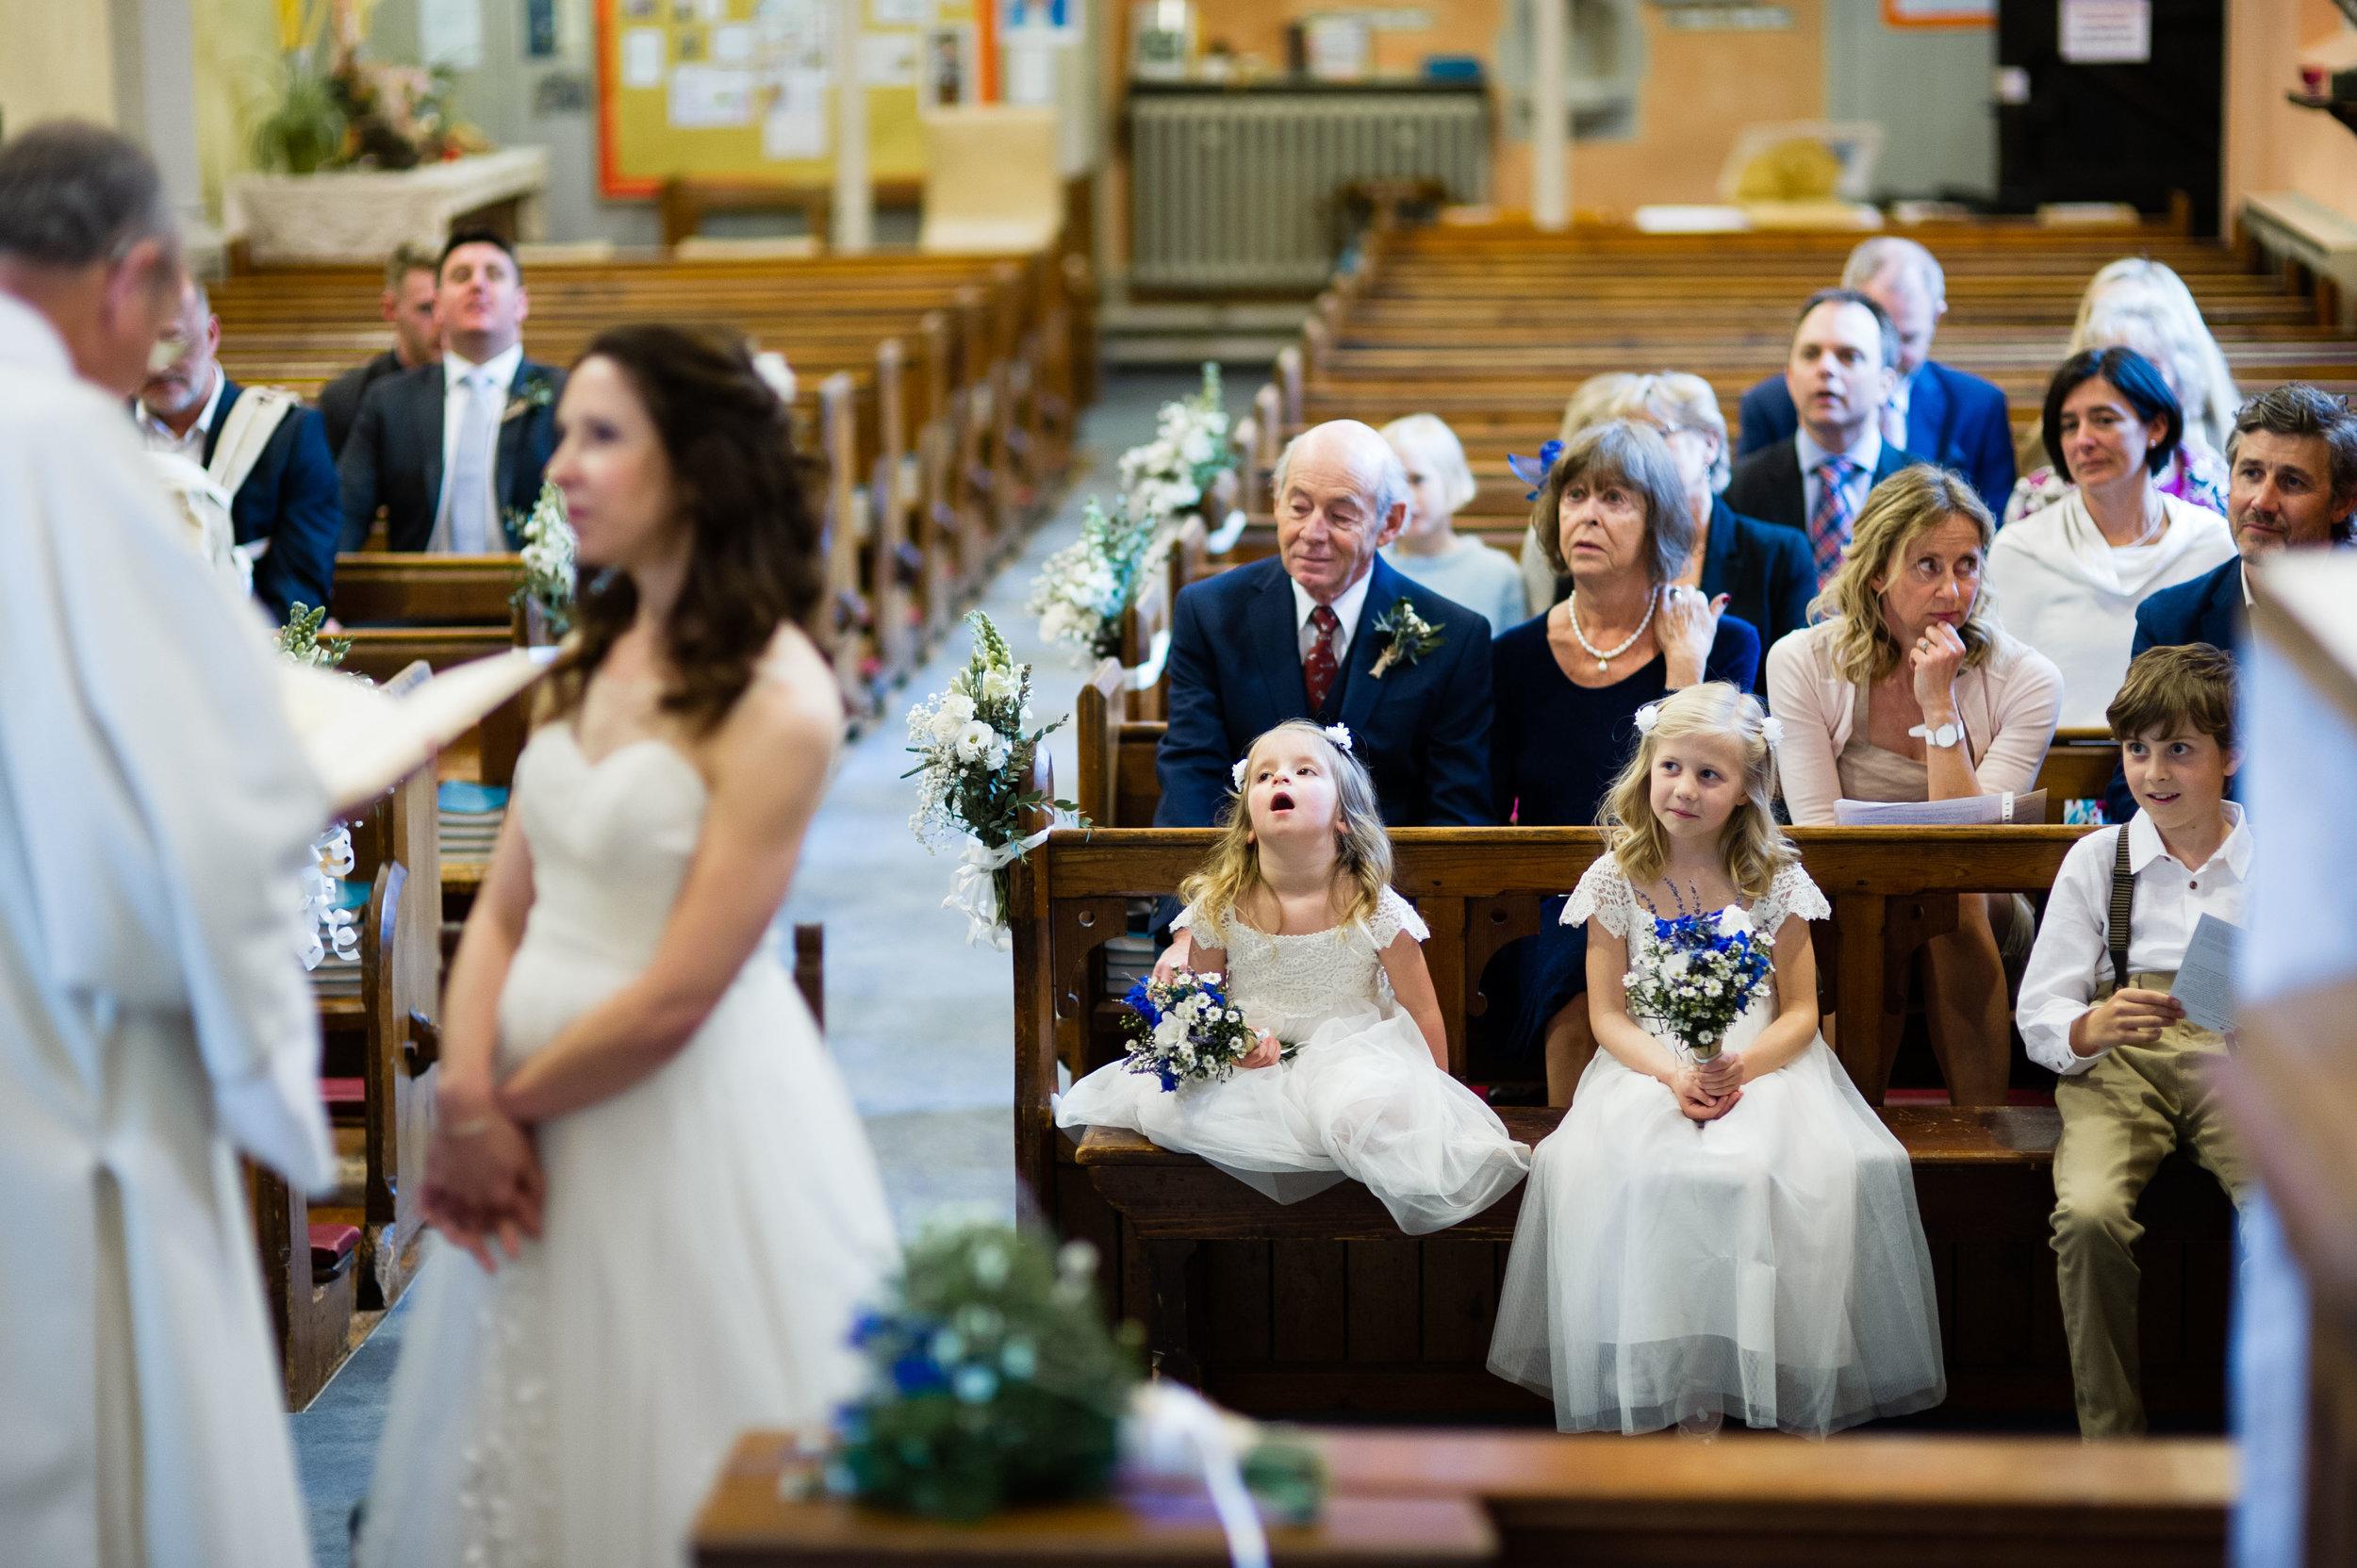 Beechfield house weddings - Abby and Greg (38 of 208).jpg